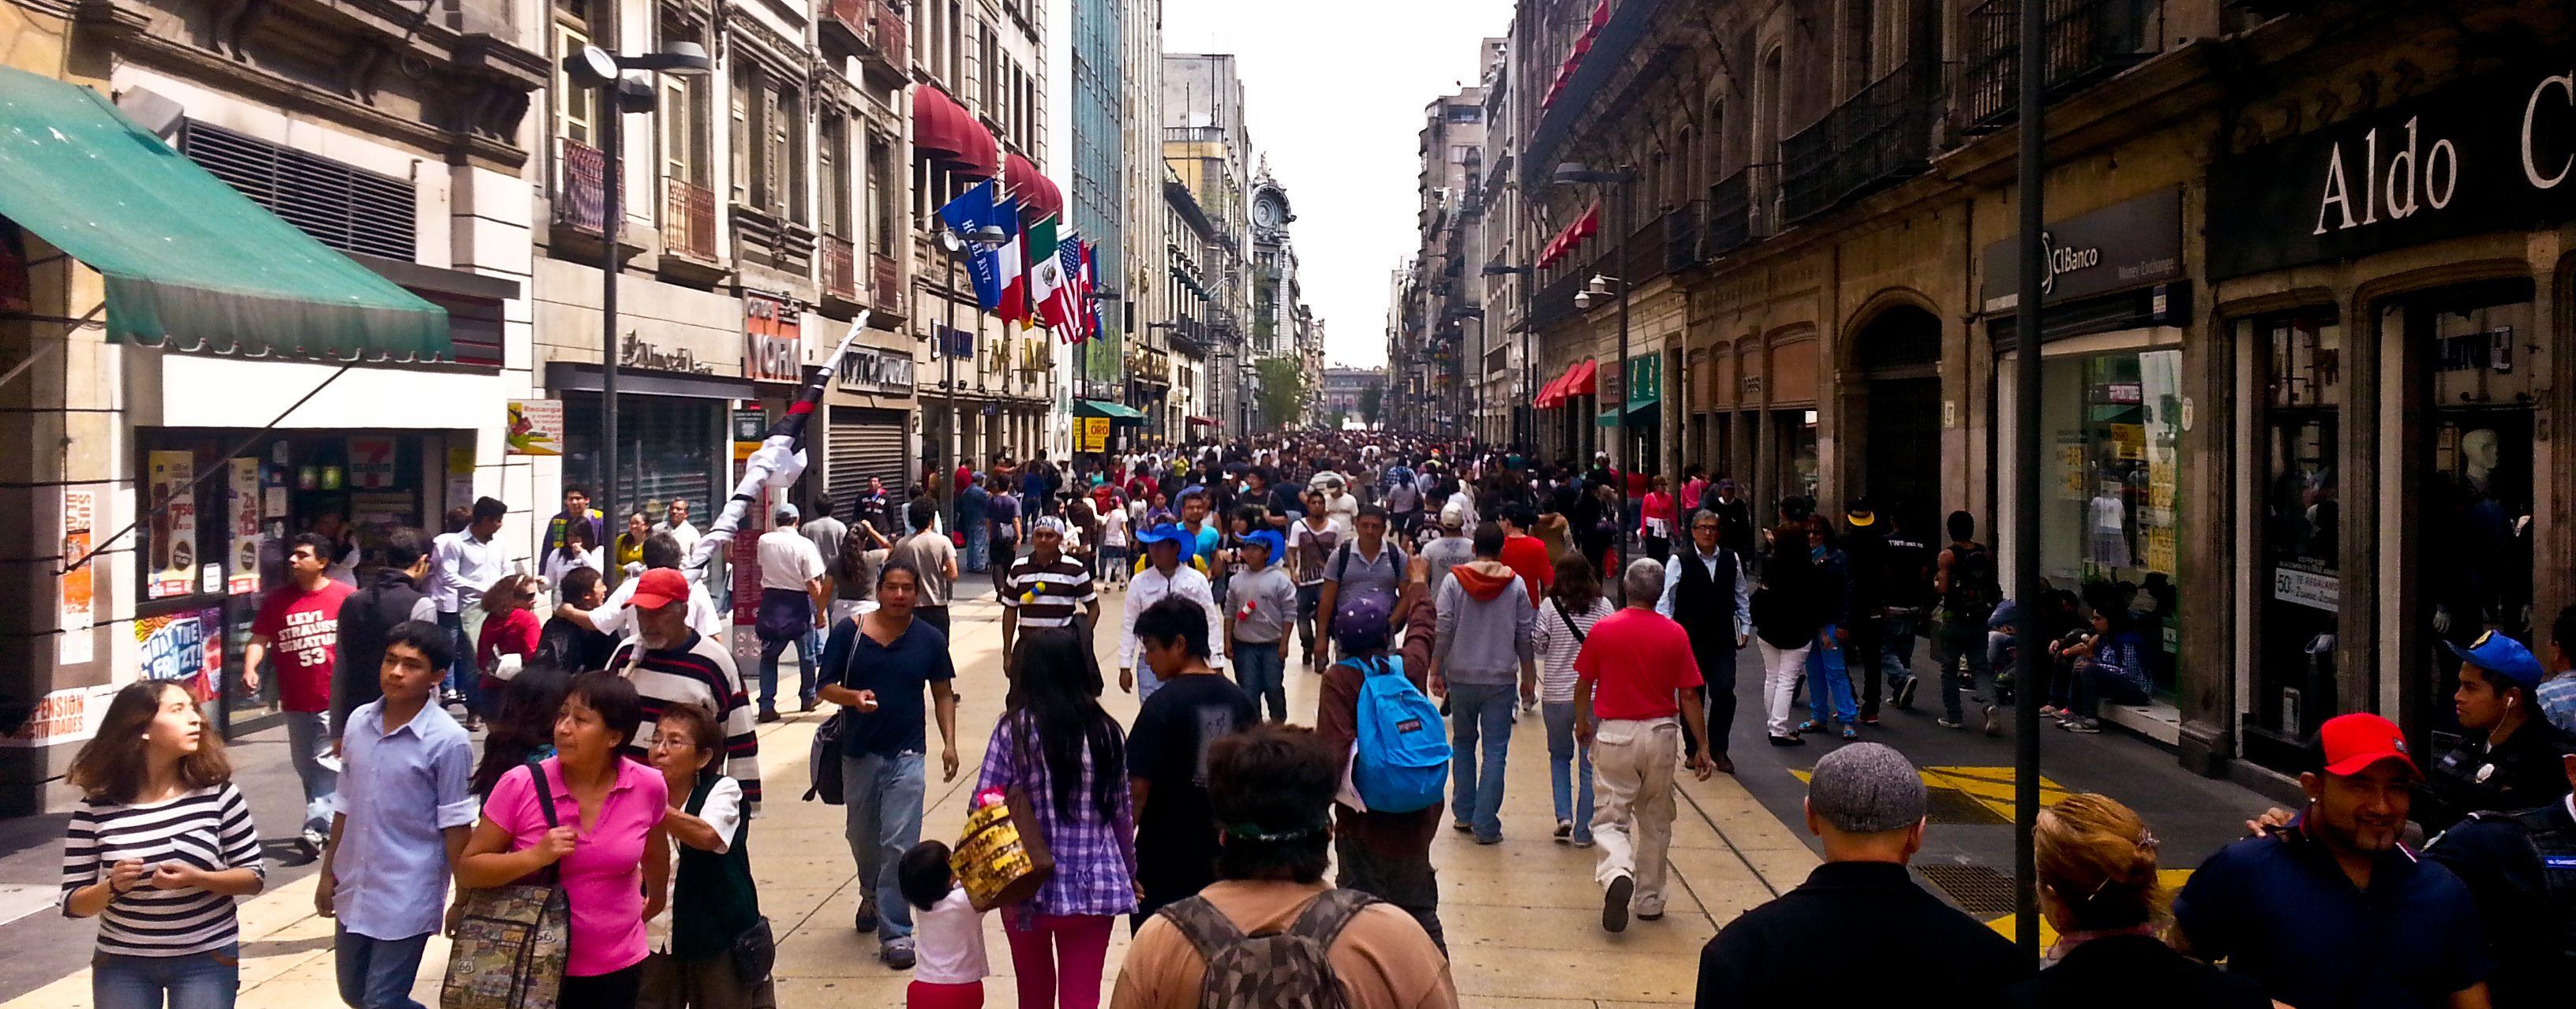 Mexico City Mexico Mexico City Pedestrian City